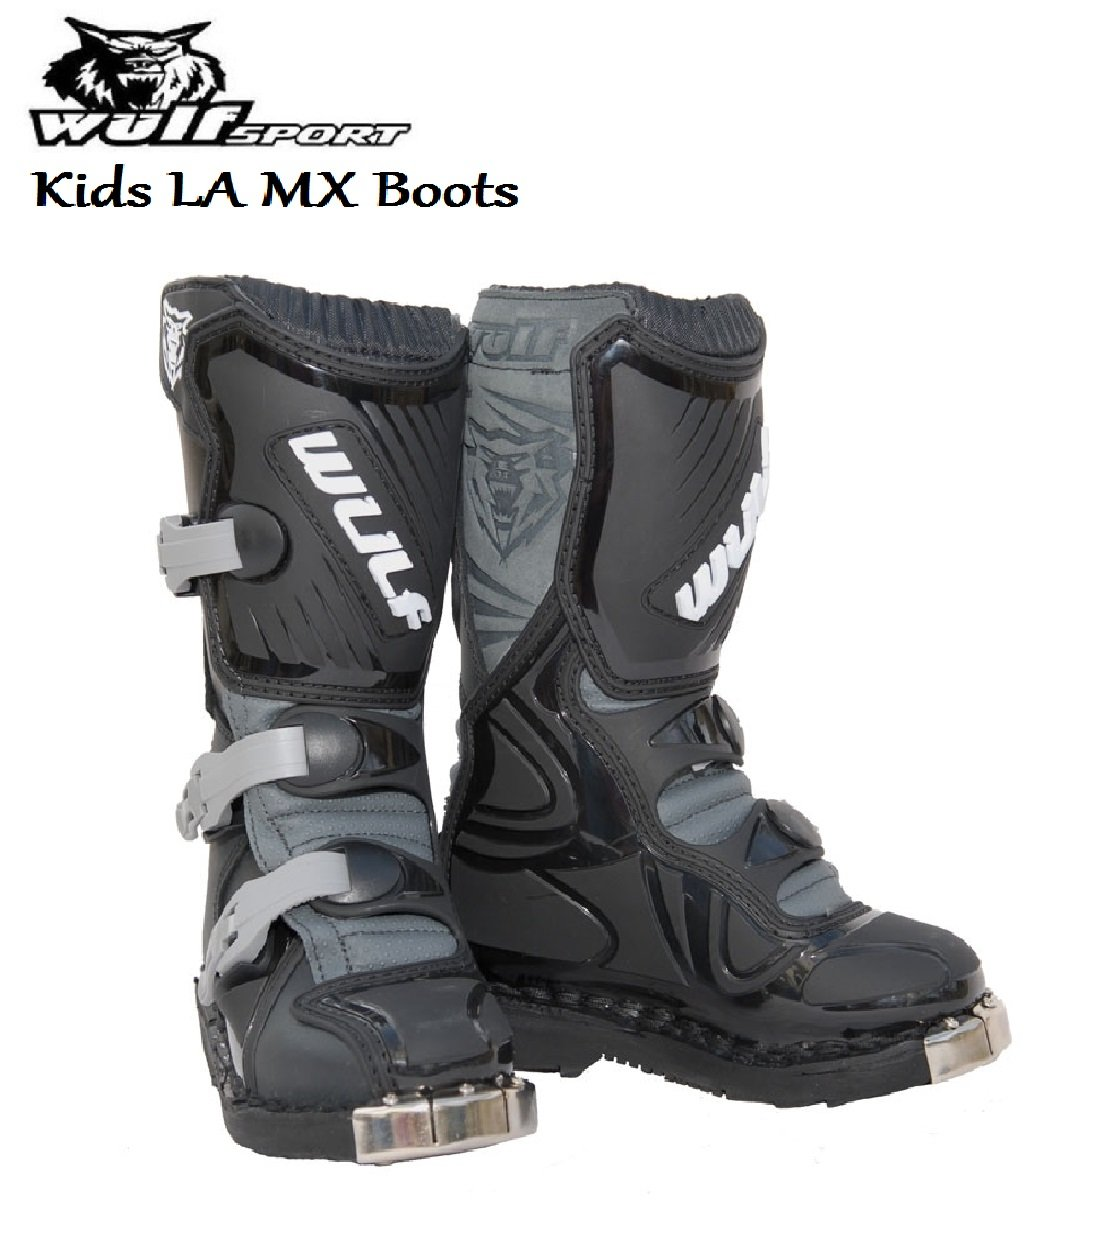 MOTORBIKE WULFSPORT KIDS MX ENDURO BOOTS Motorcycle Motocross Sport Racing Boots BLACK